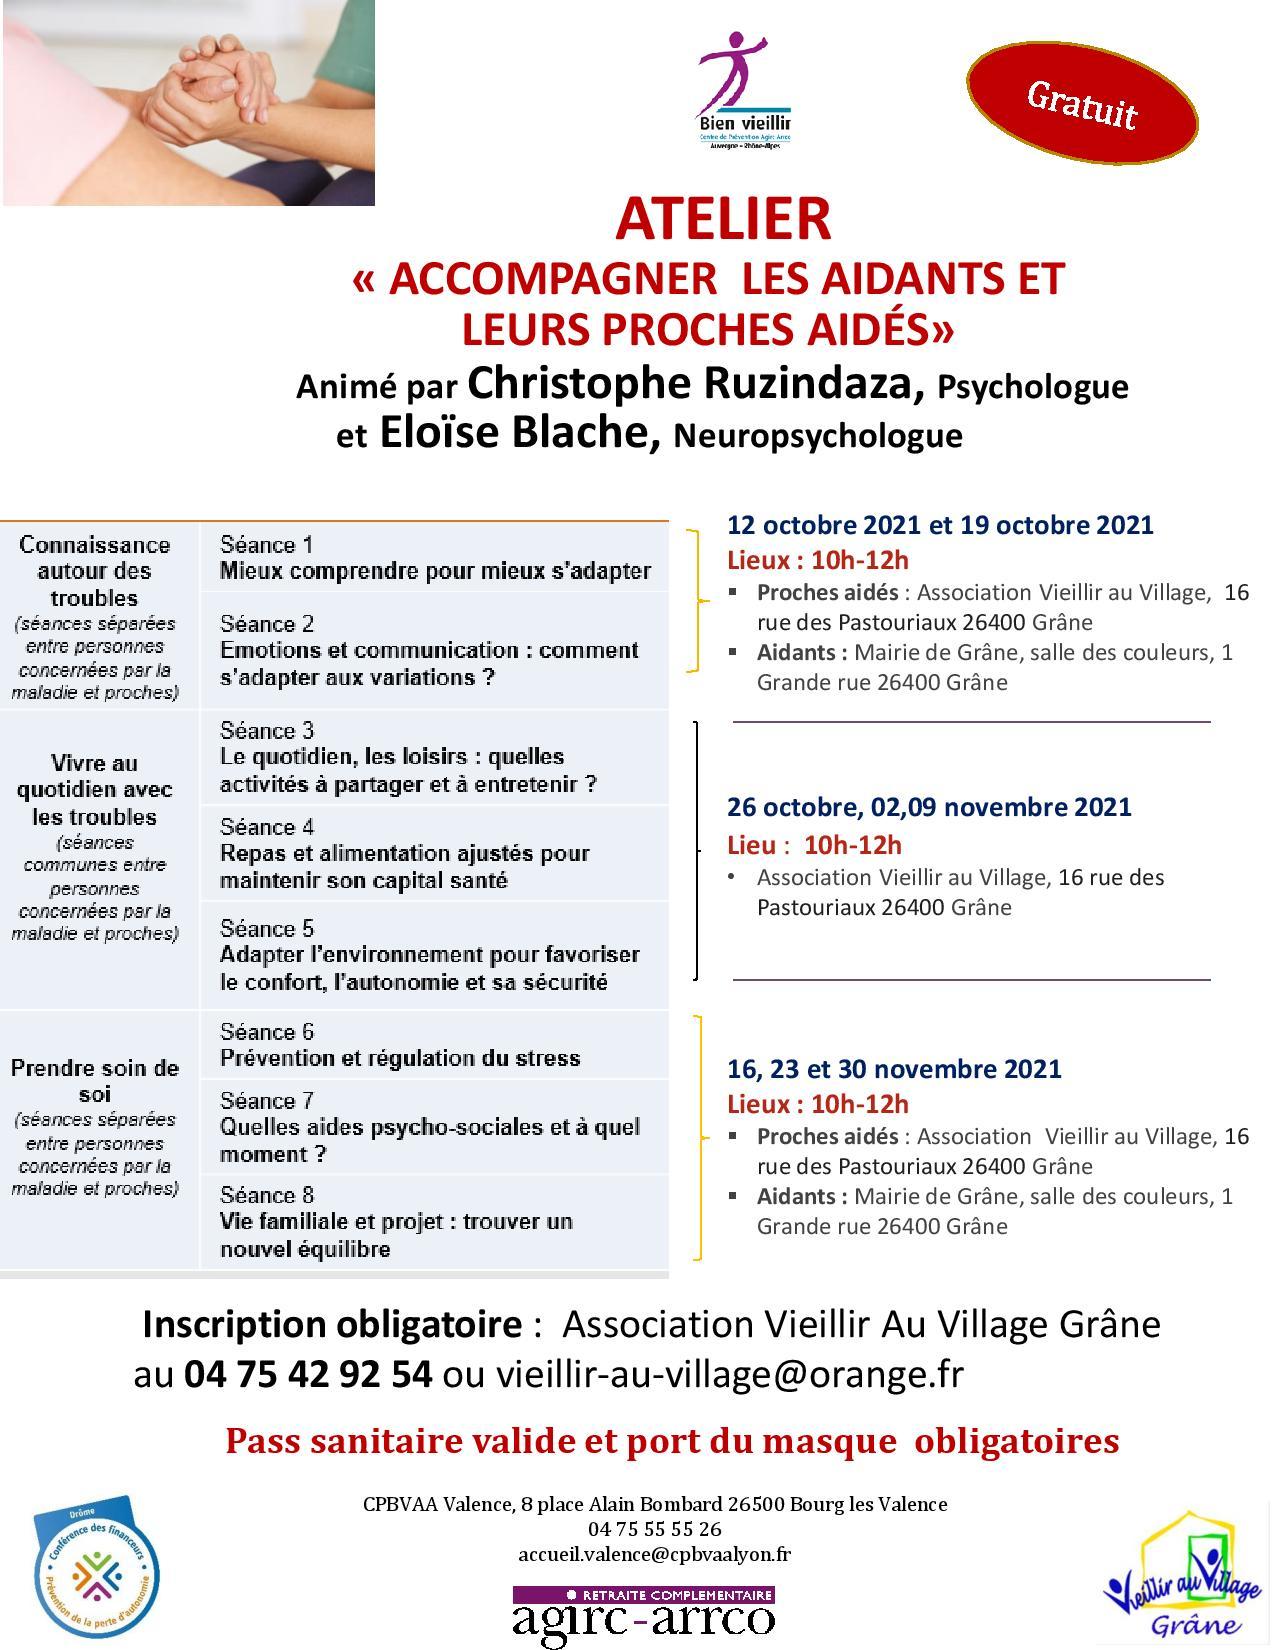 210915_DOC_AteliersAidantsGrâne-page-001.jpg